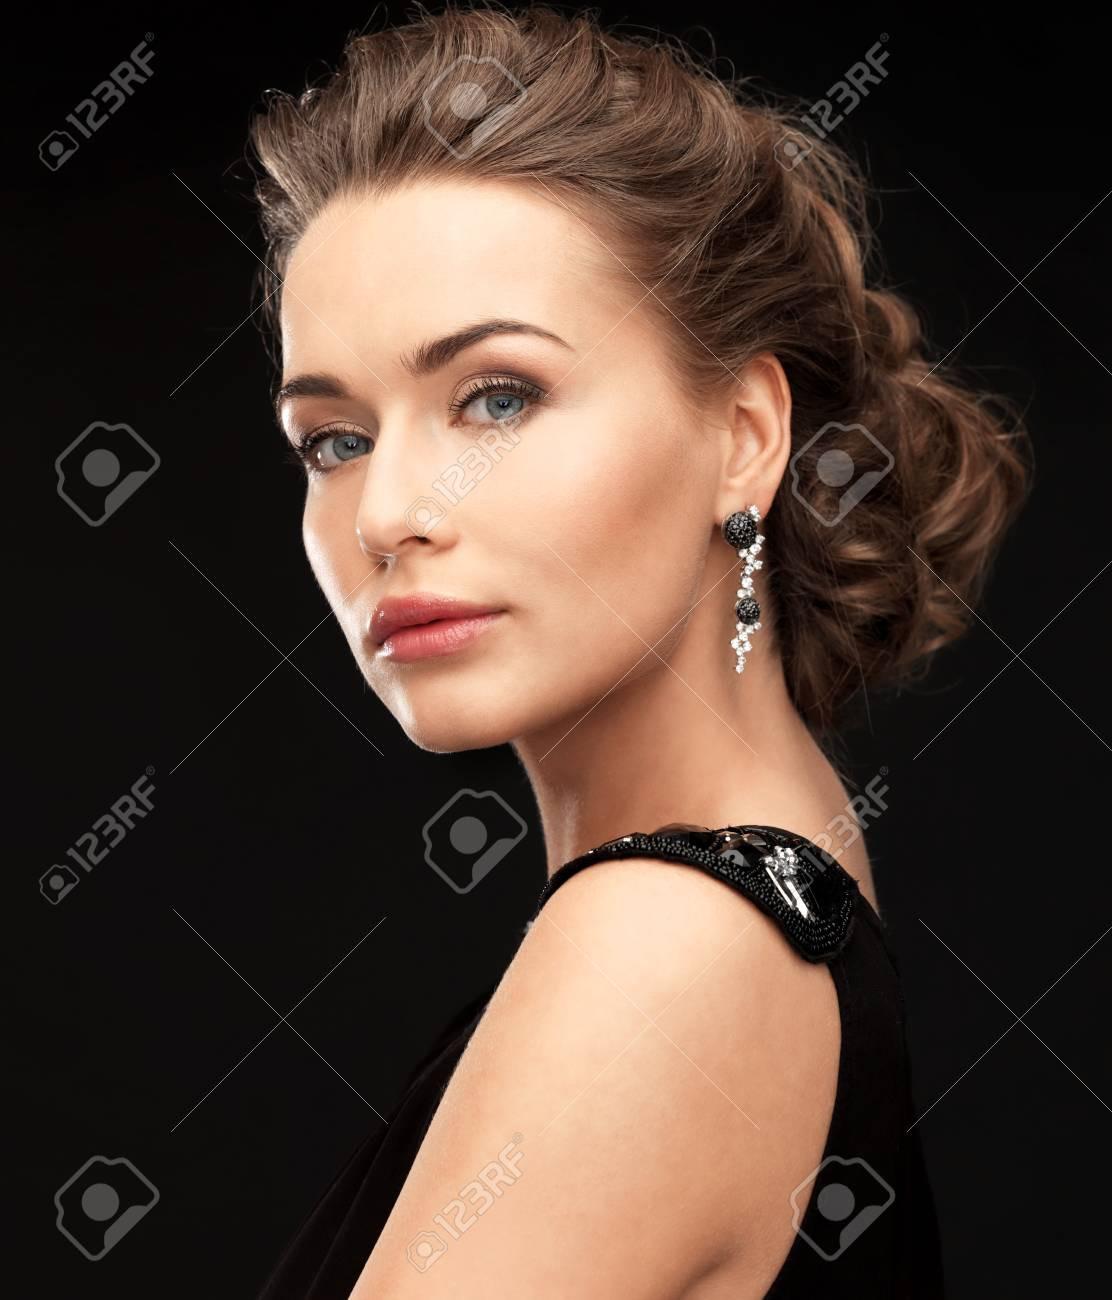 Designer Spektakulär Ohrringe Abendkleid BoutiqueDesigner Ausgezeichnet Ohrringe Abendkleid Galerie